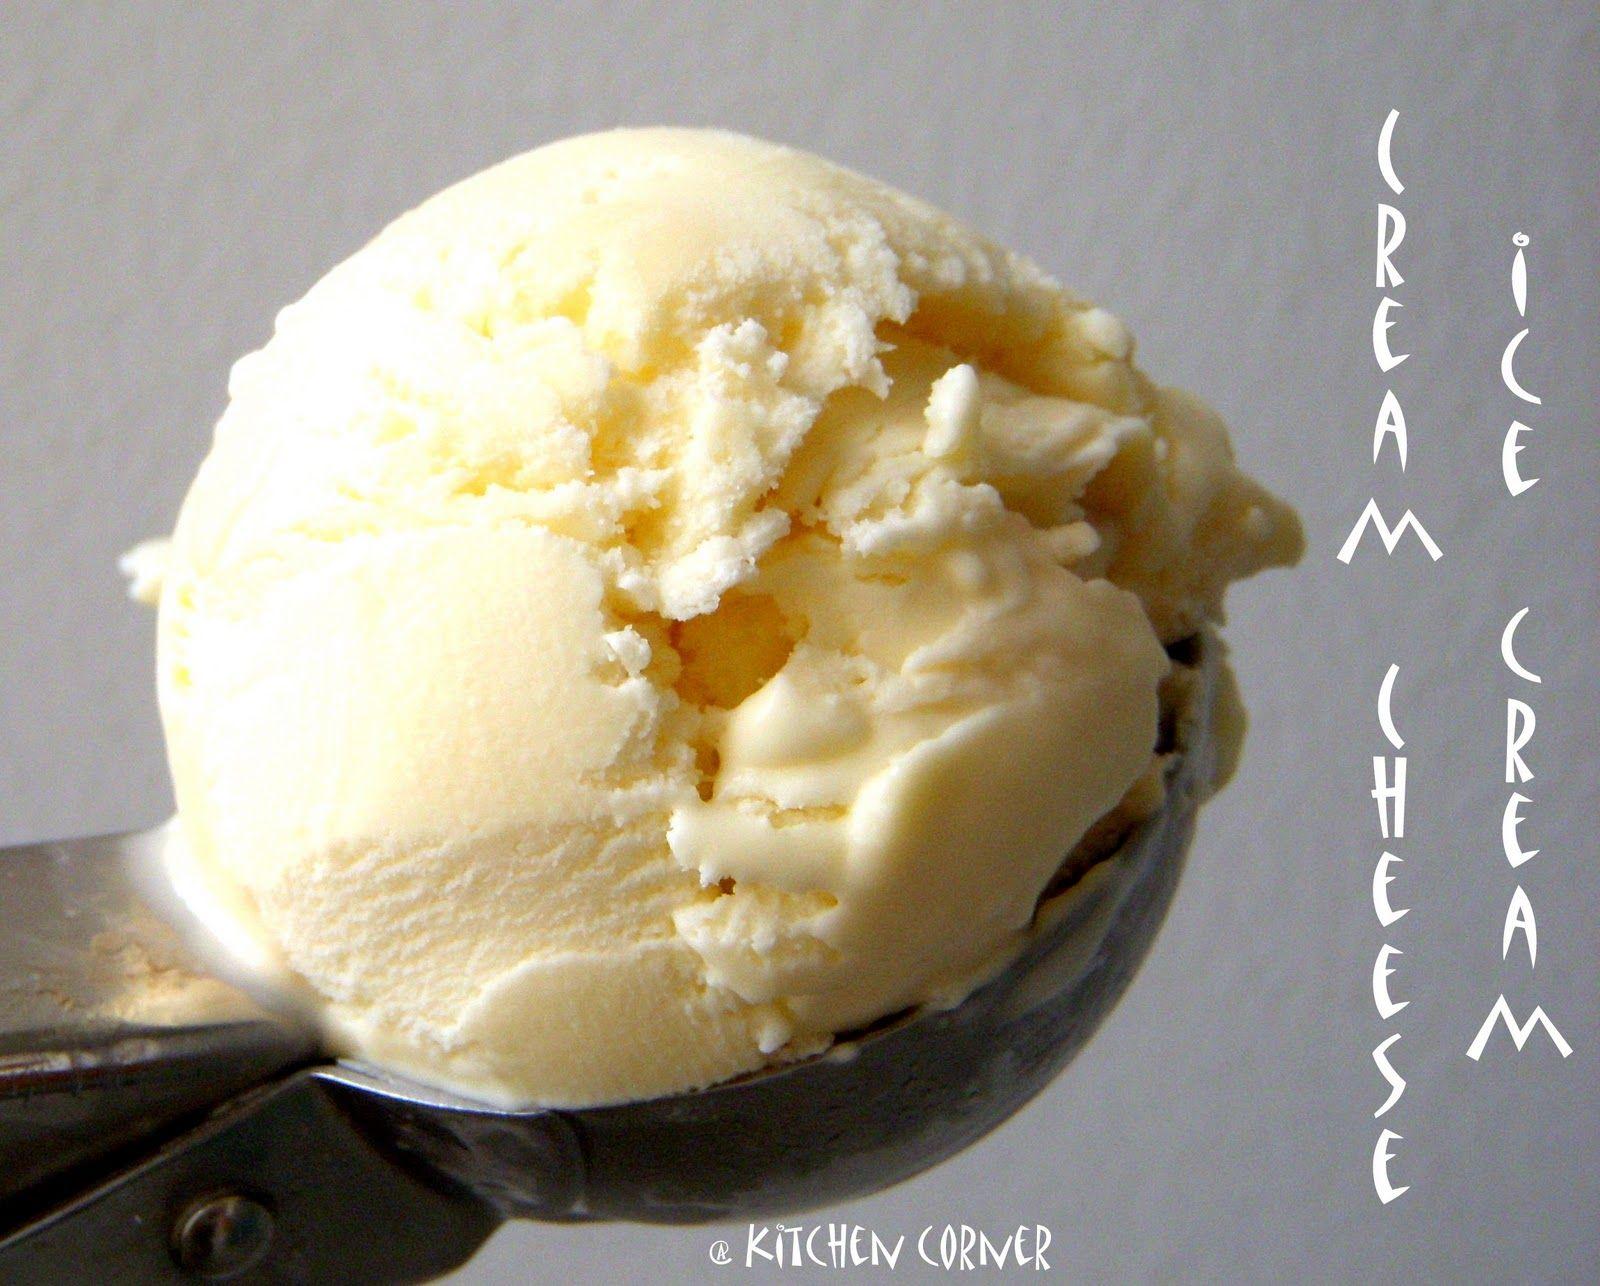 Cream Cheese Ice Cream #cheesecakeicecream